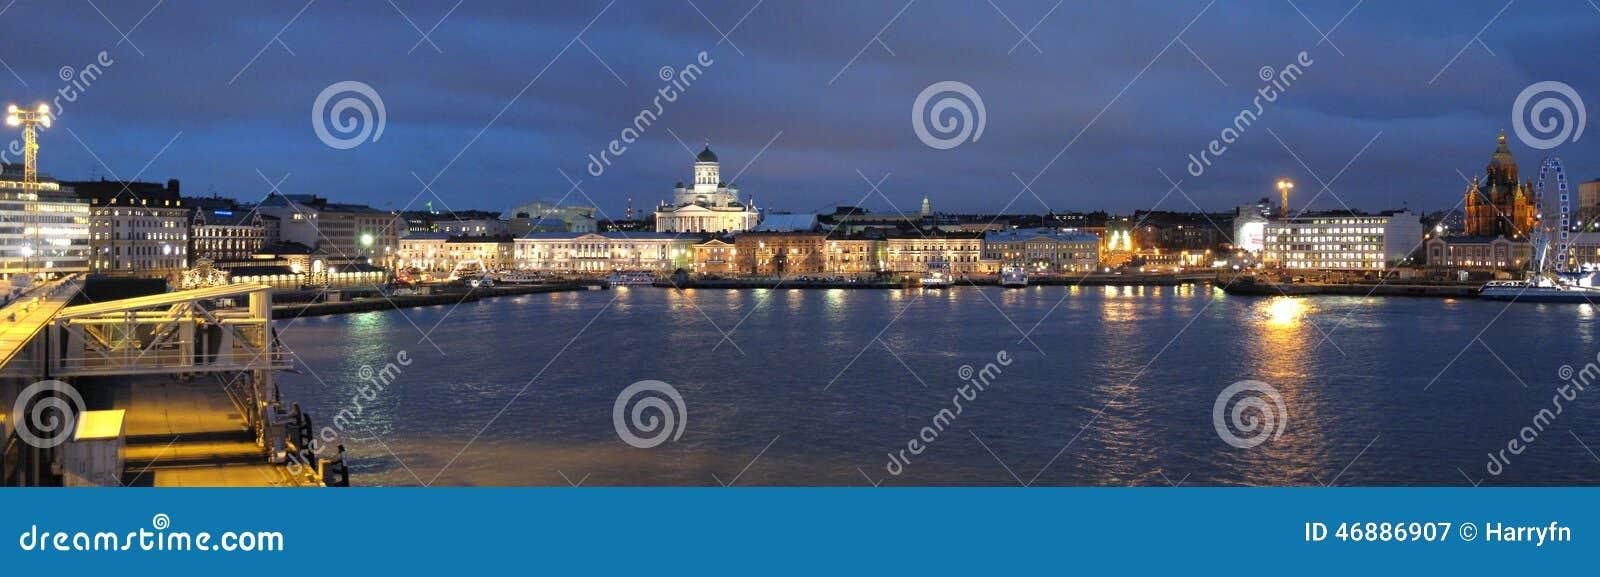 s nachts Helsinki